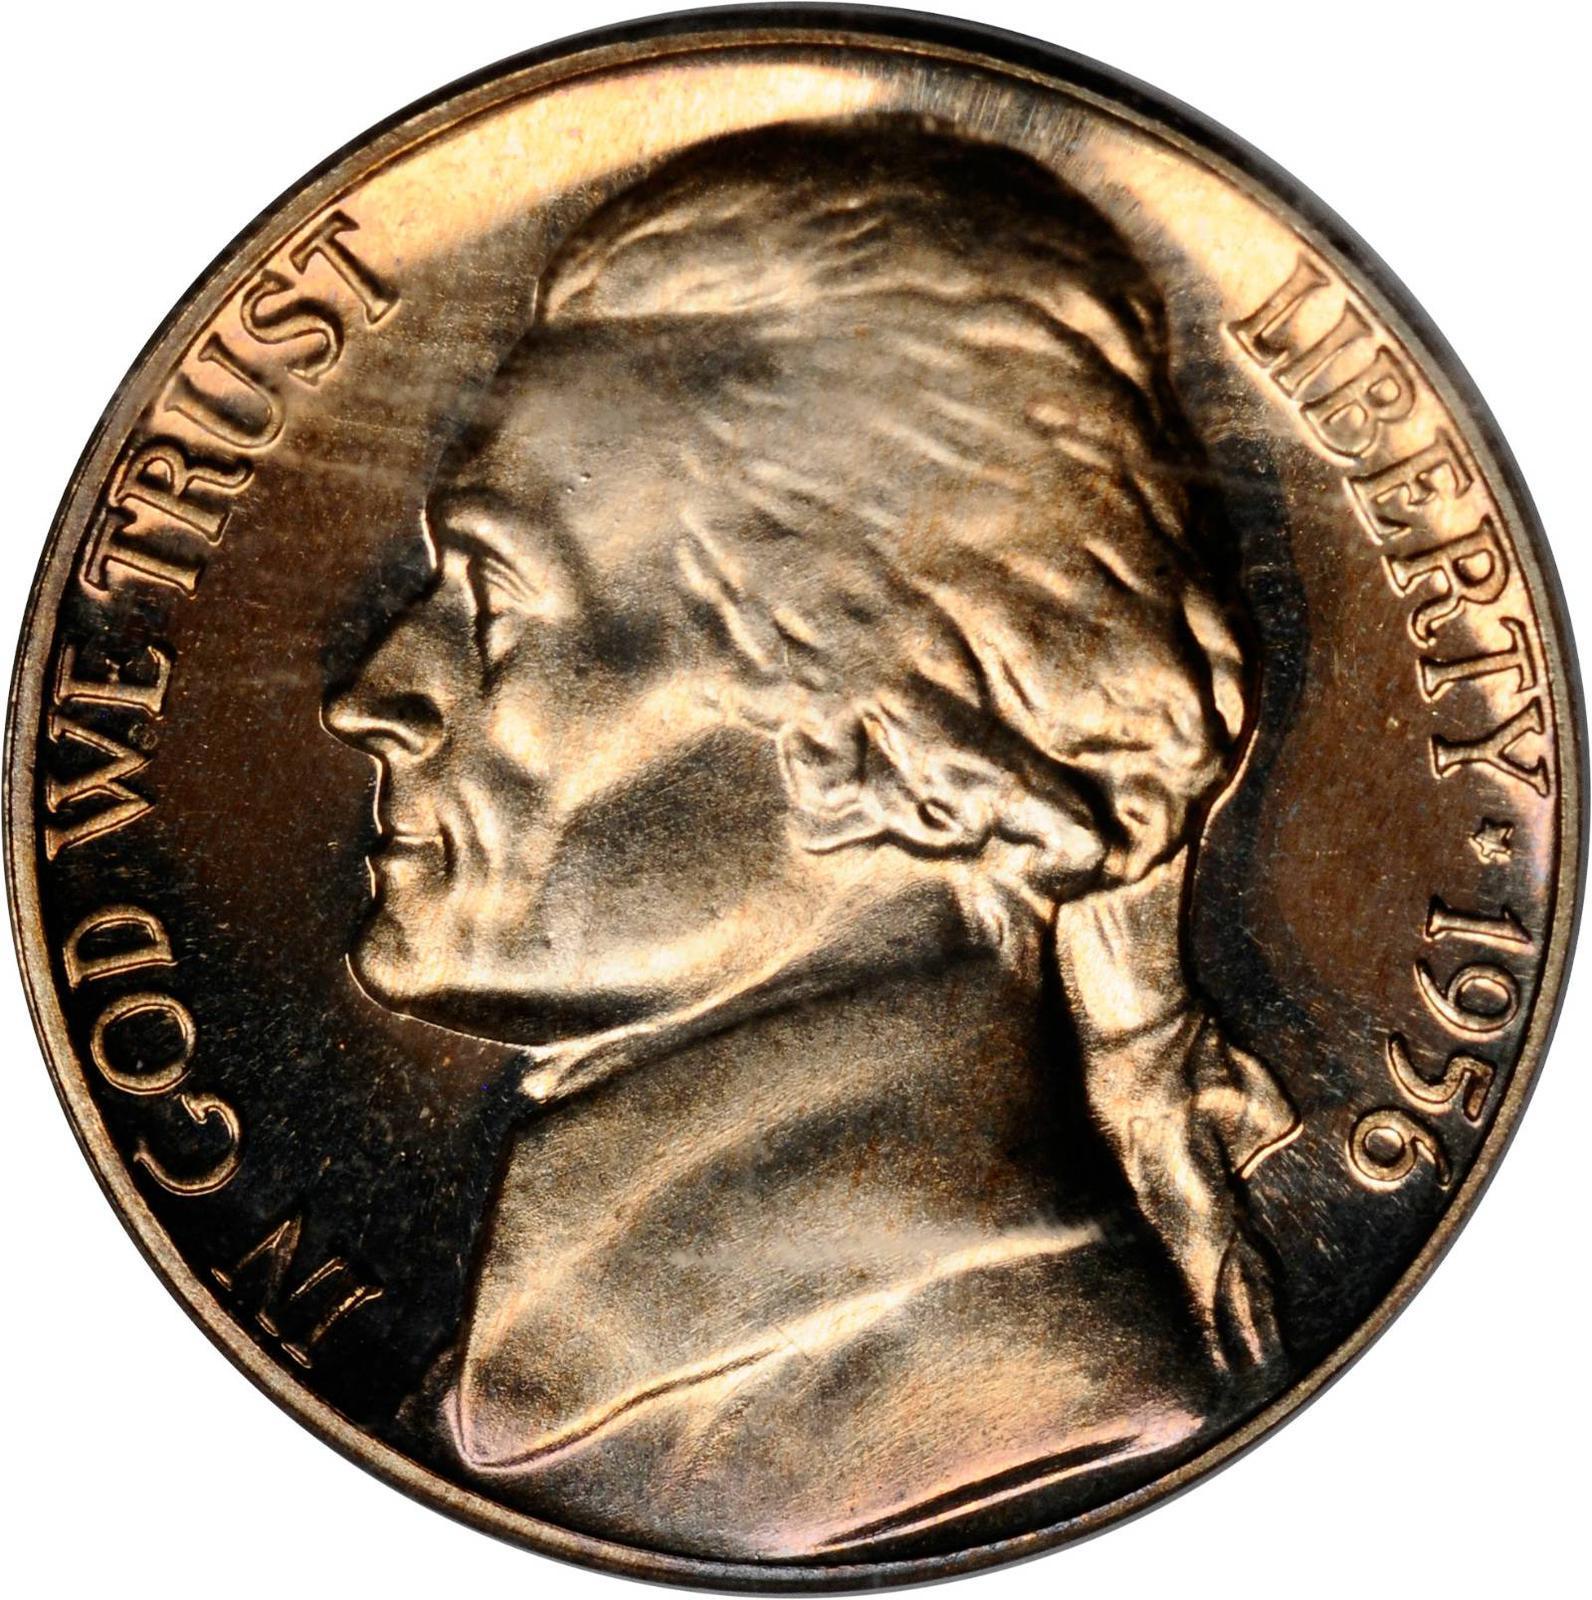 Value Of 1956 Jefferson Nickel